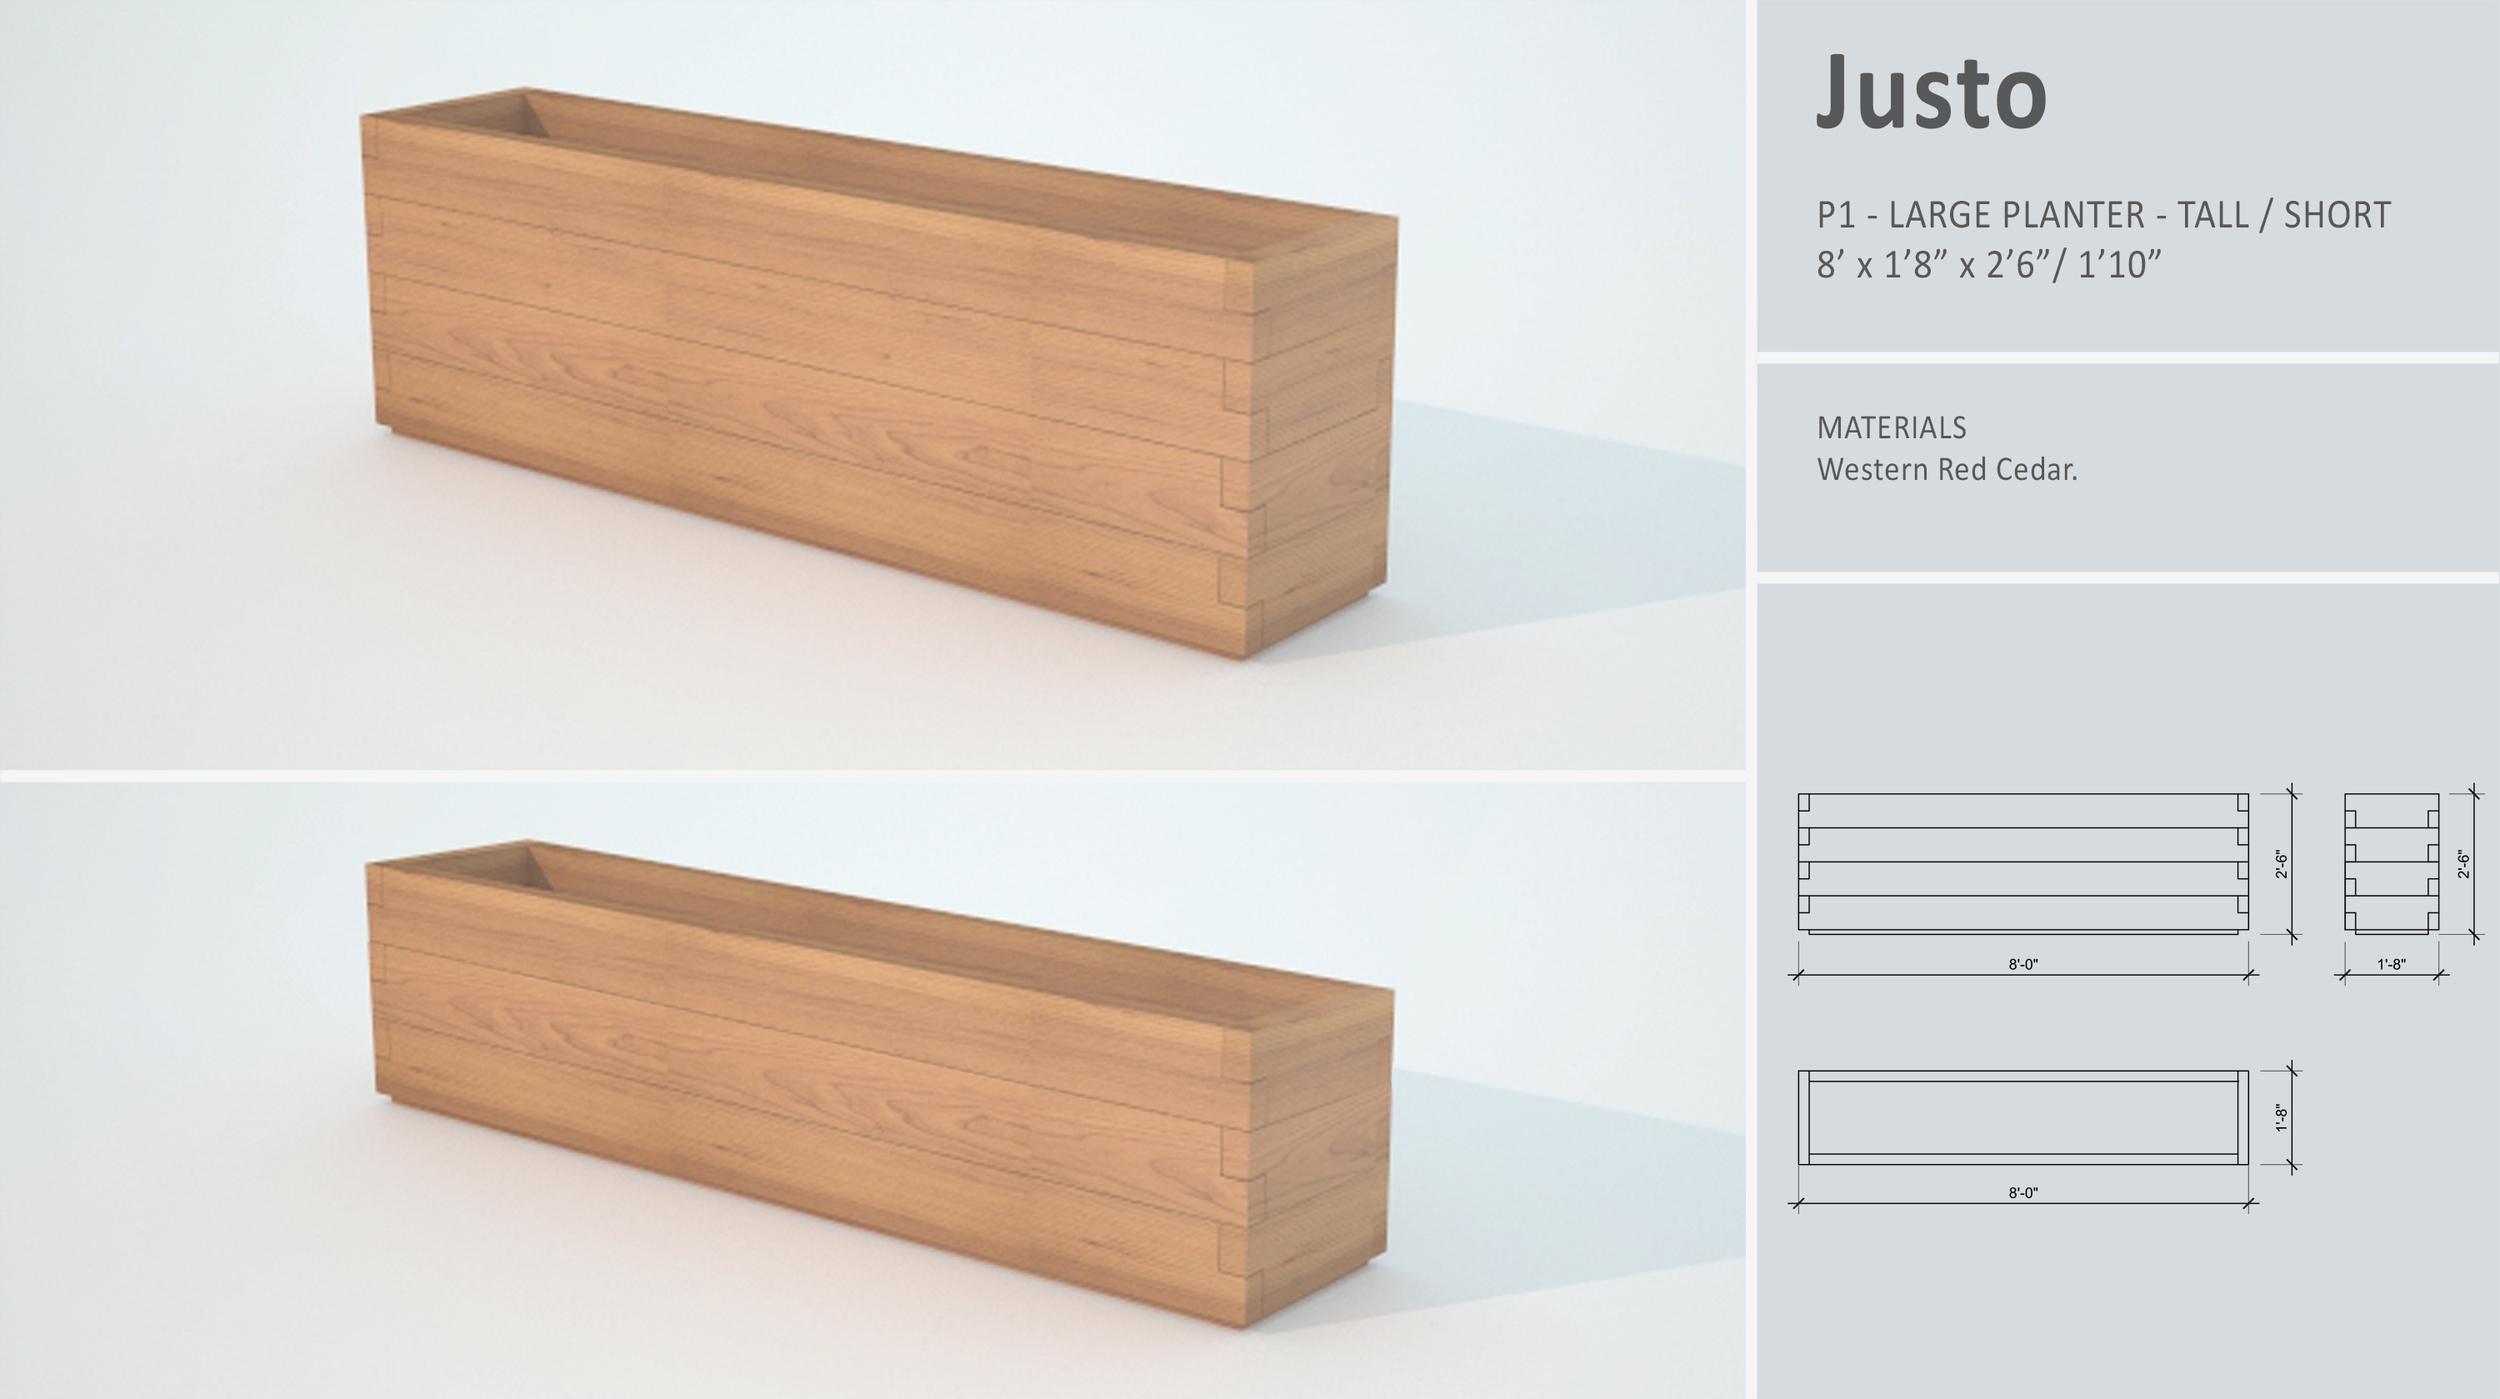 TECHNICAL SHEET PLANTER P1 - JUSTO.jpg